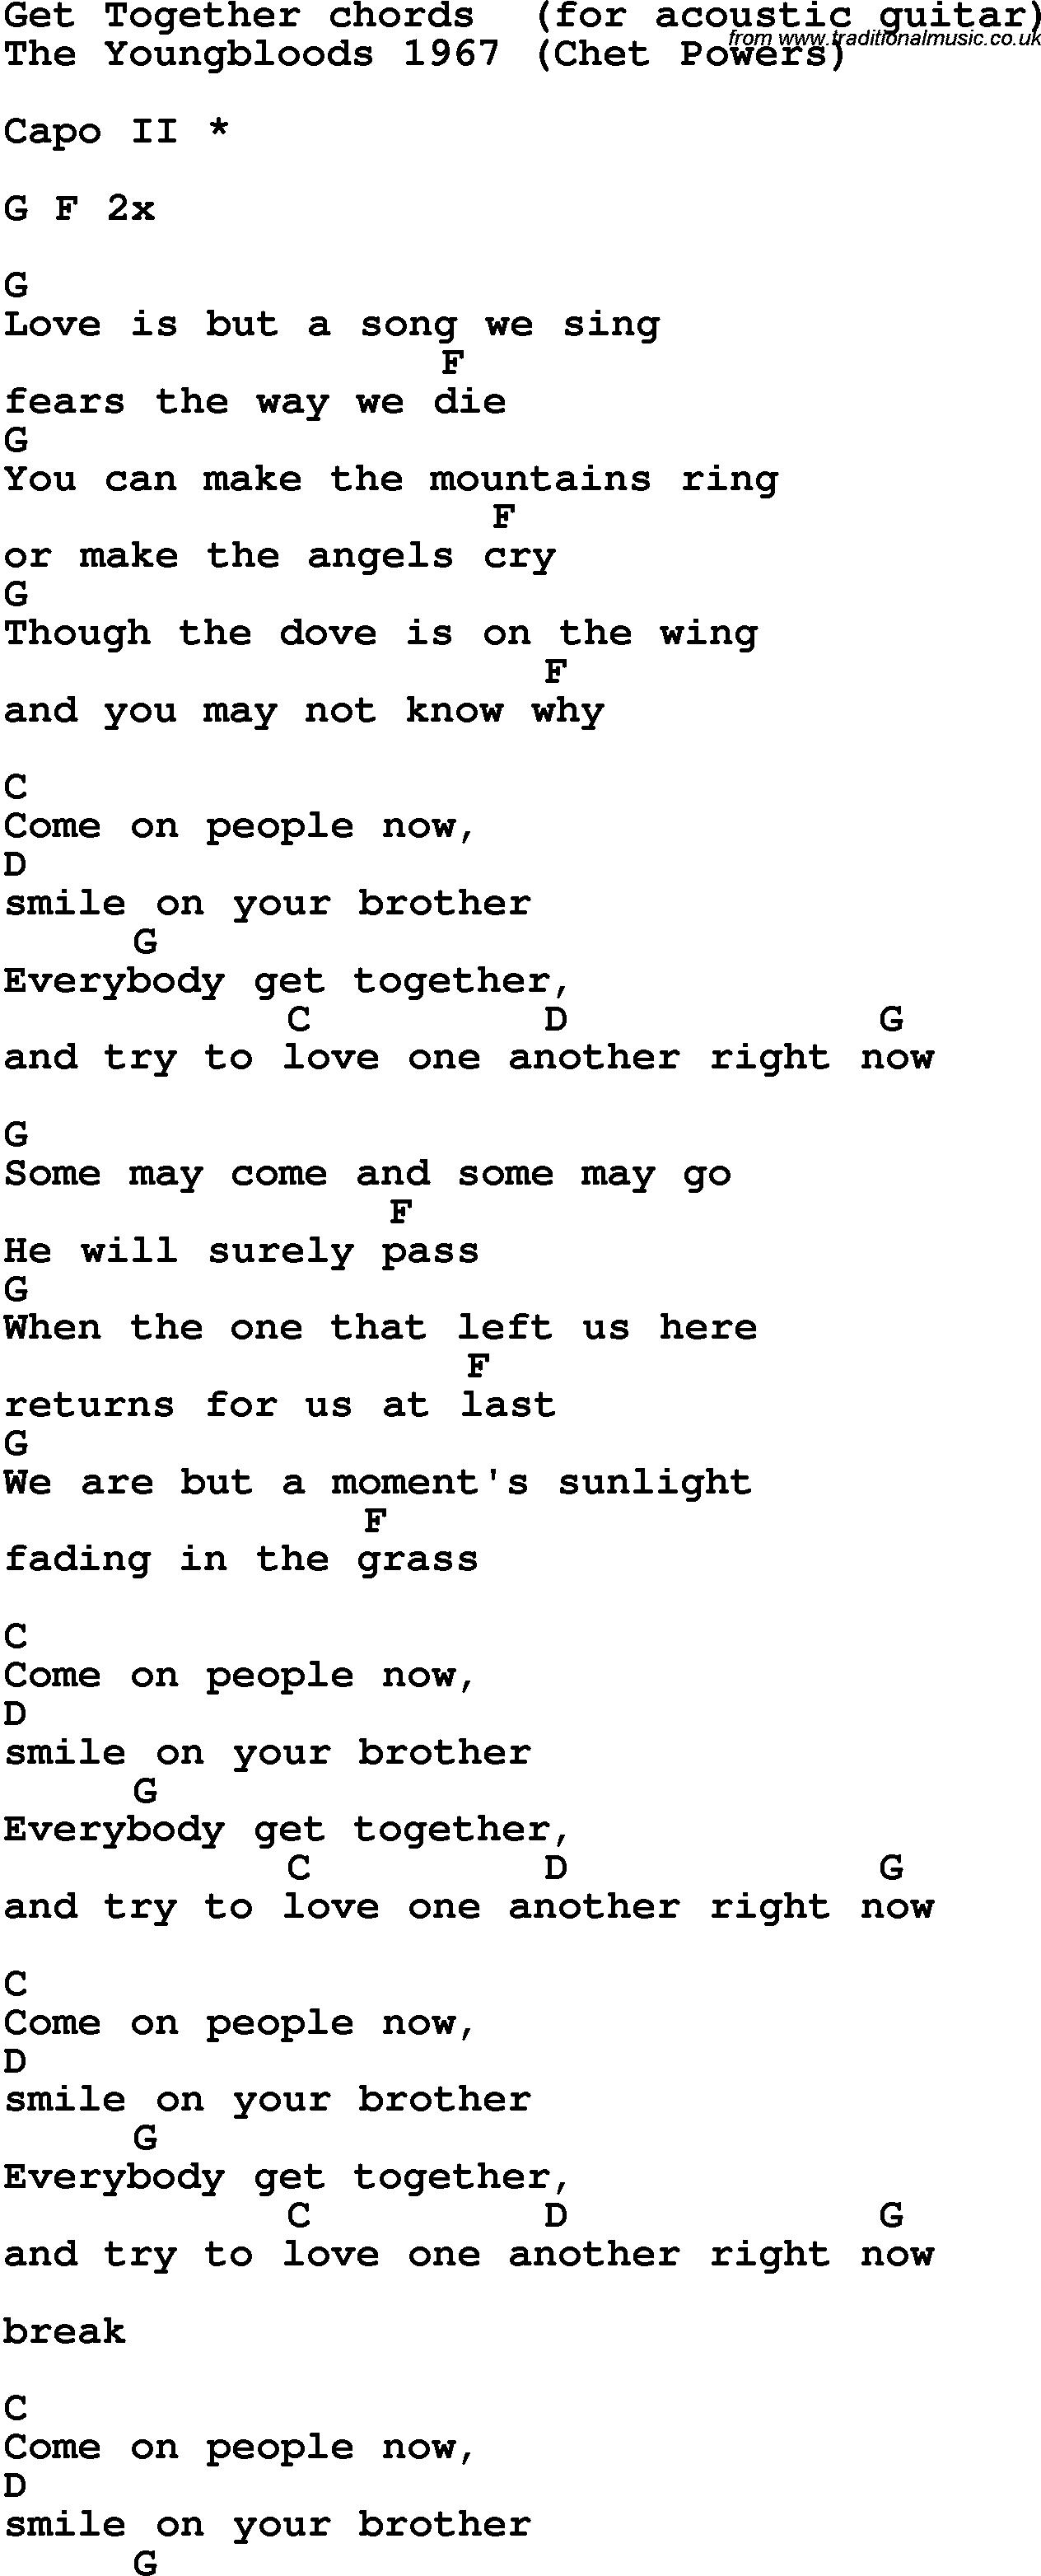 Song Lyrics With Guitar Chords For Get Together Ukuleleforbeginners